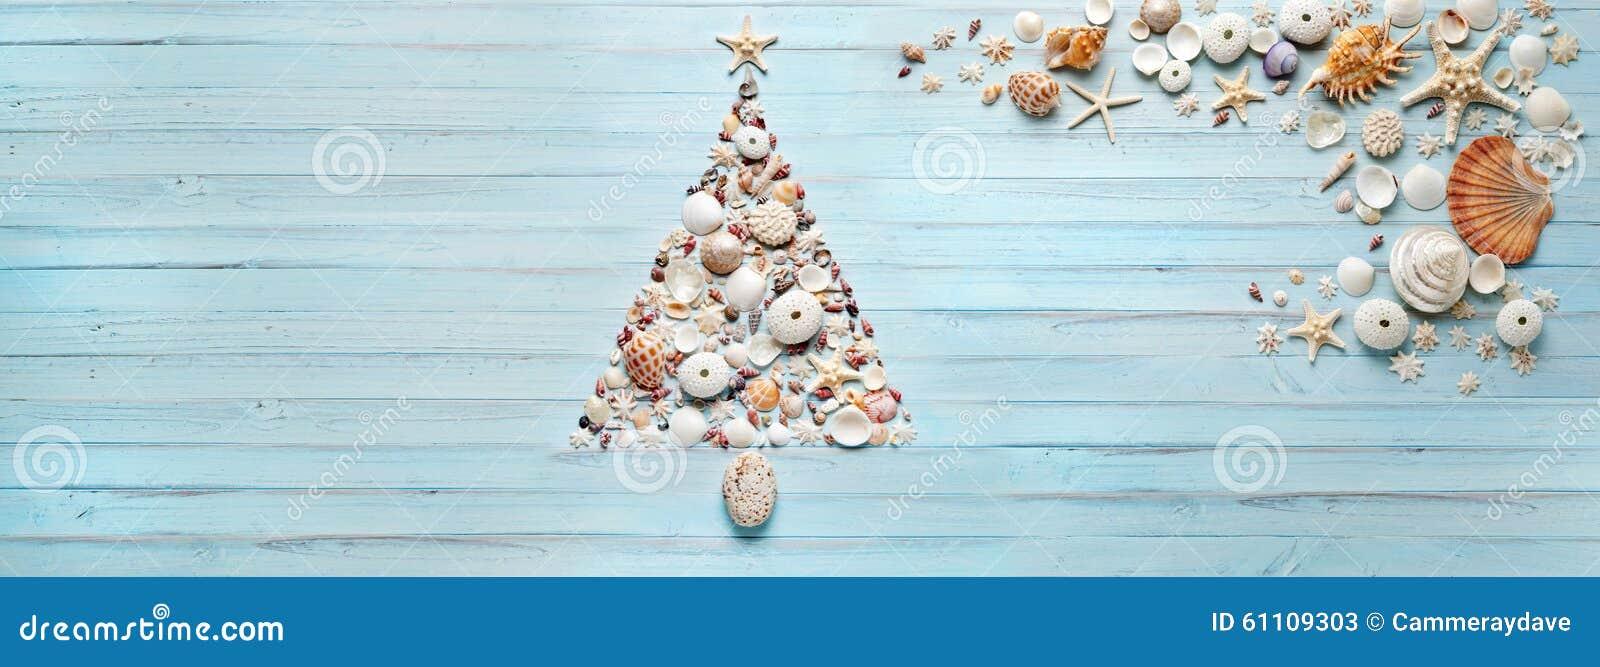 Kerstboomshells Bannerachtergrond